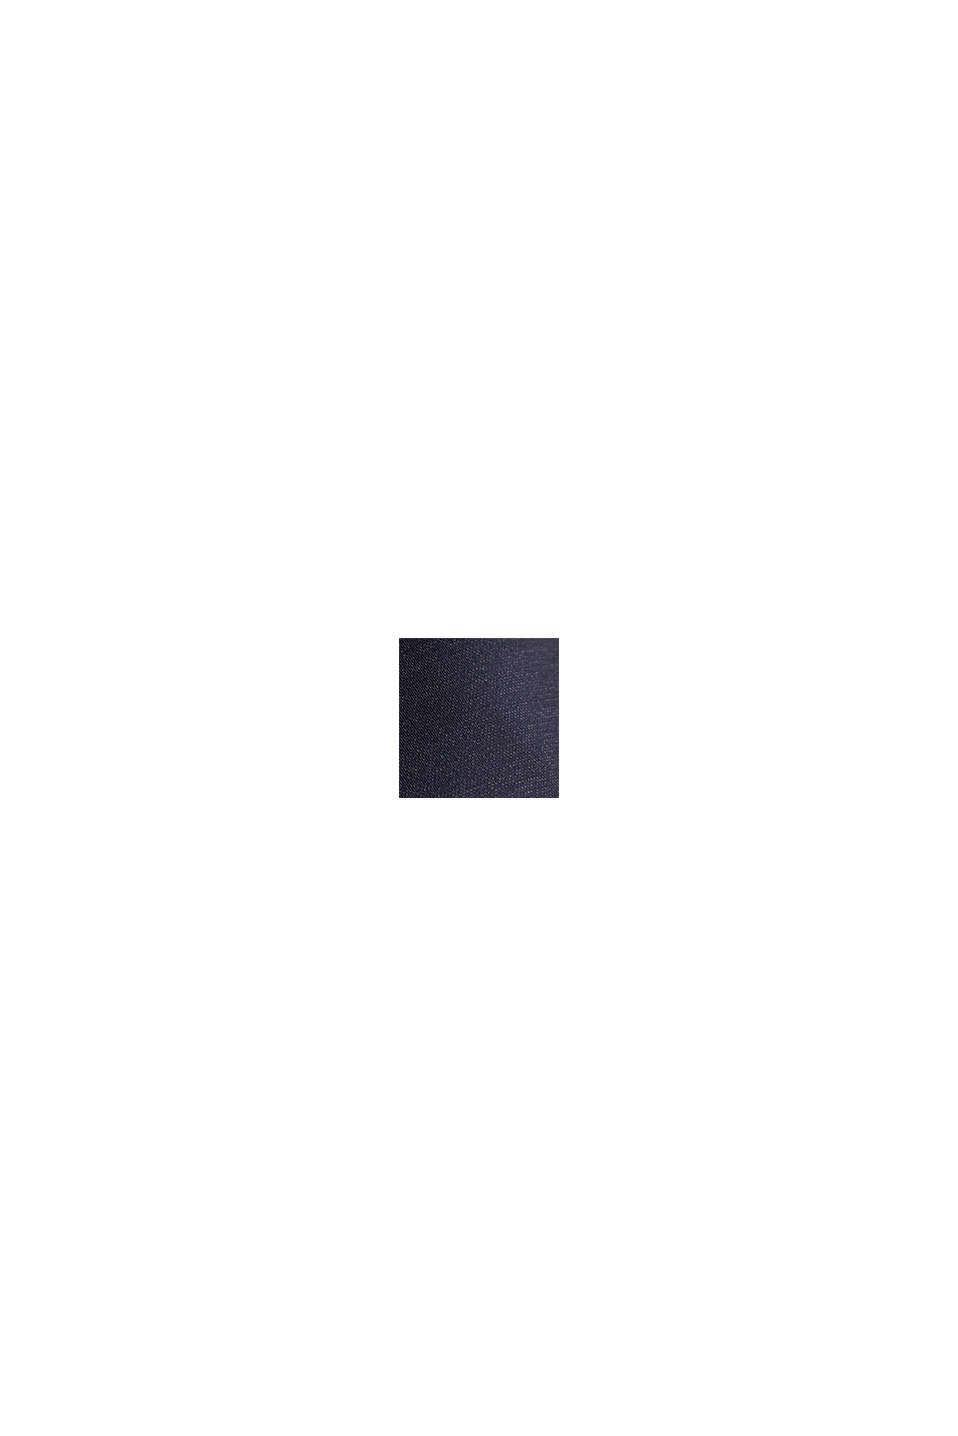 JOGG SUIT Mix + Match: Sakko, DARK BLUE, swatch